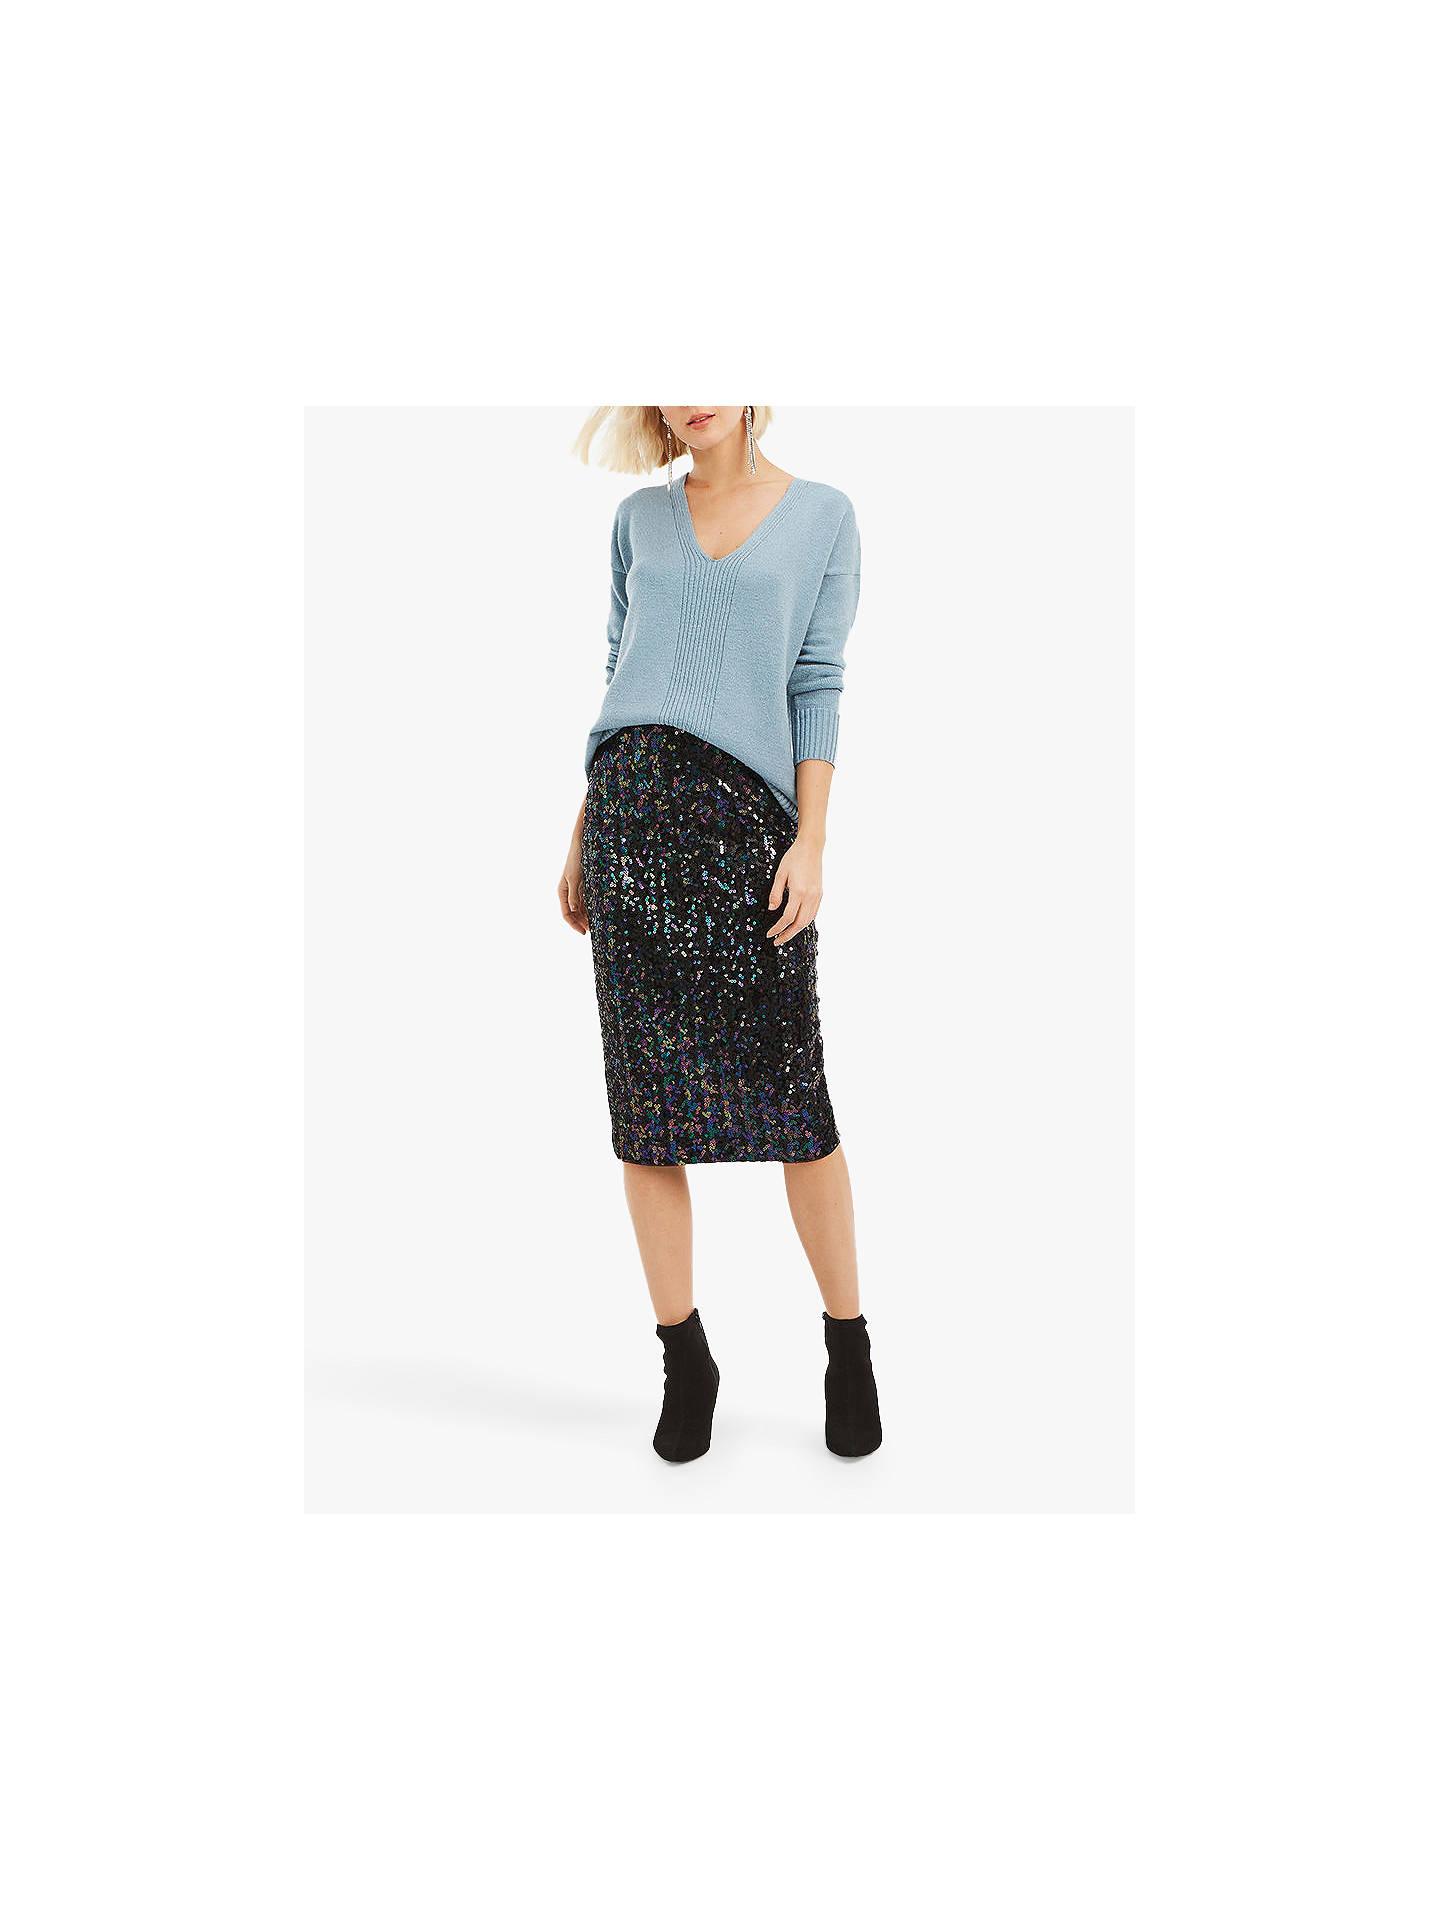 7c54dac746 Buy Oasis Sequin Pencil Midi Skirt, Black/Multi, S Online at johnlewis.